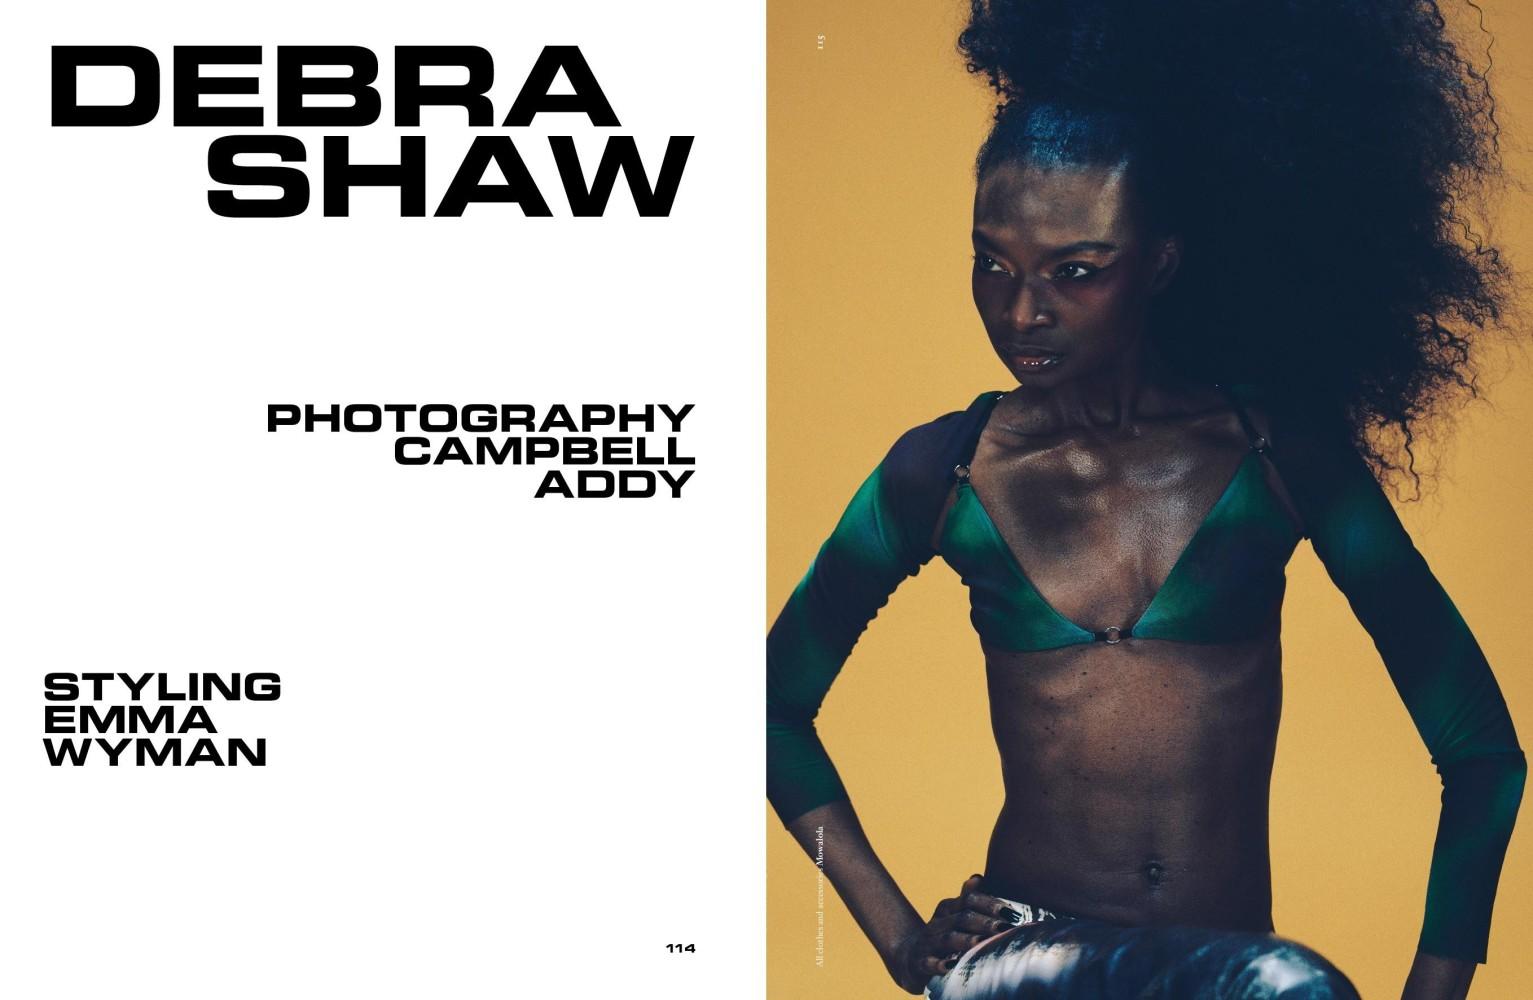 DEBRA SHAW COVERS DAZED MAGAZINE